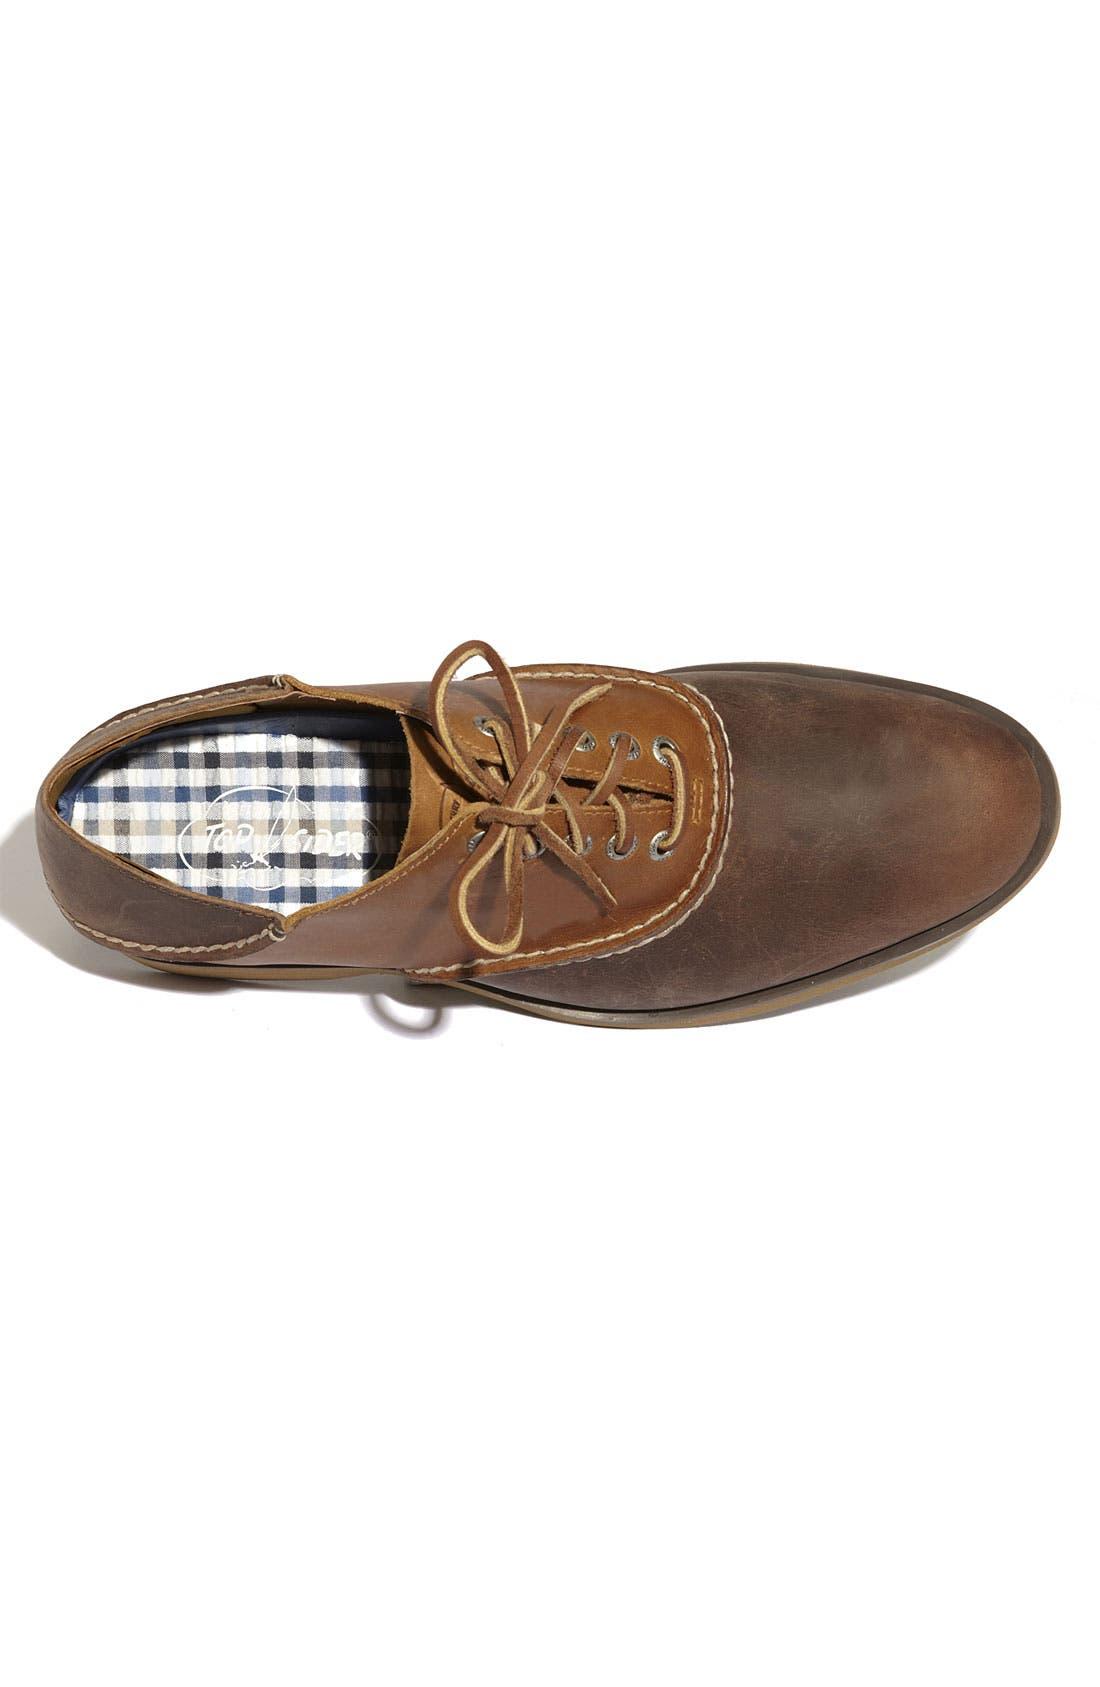 Alternate Image 3  - Sperry Top-Sider® 'Boat' Oxford Saddle Shoe